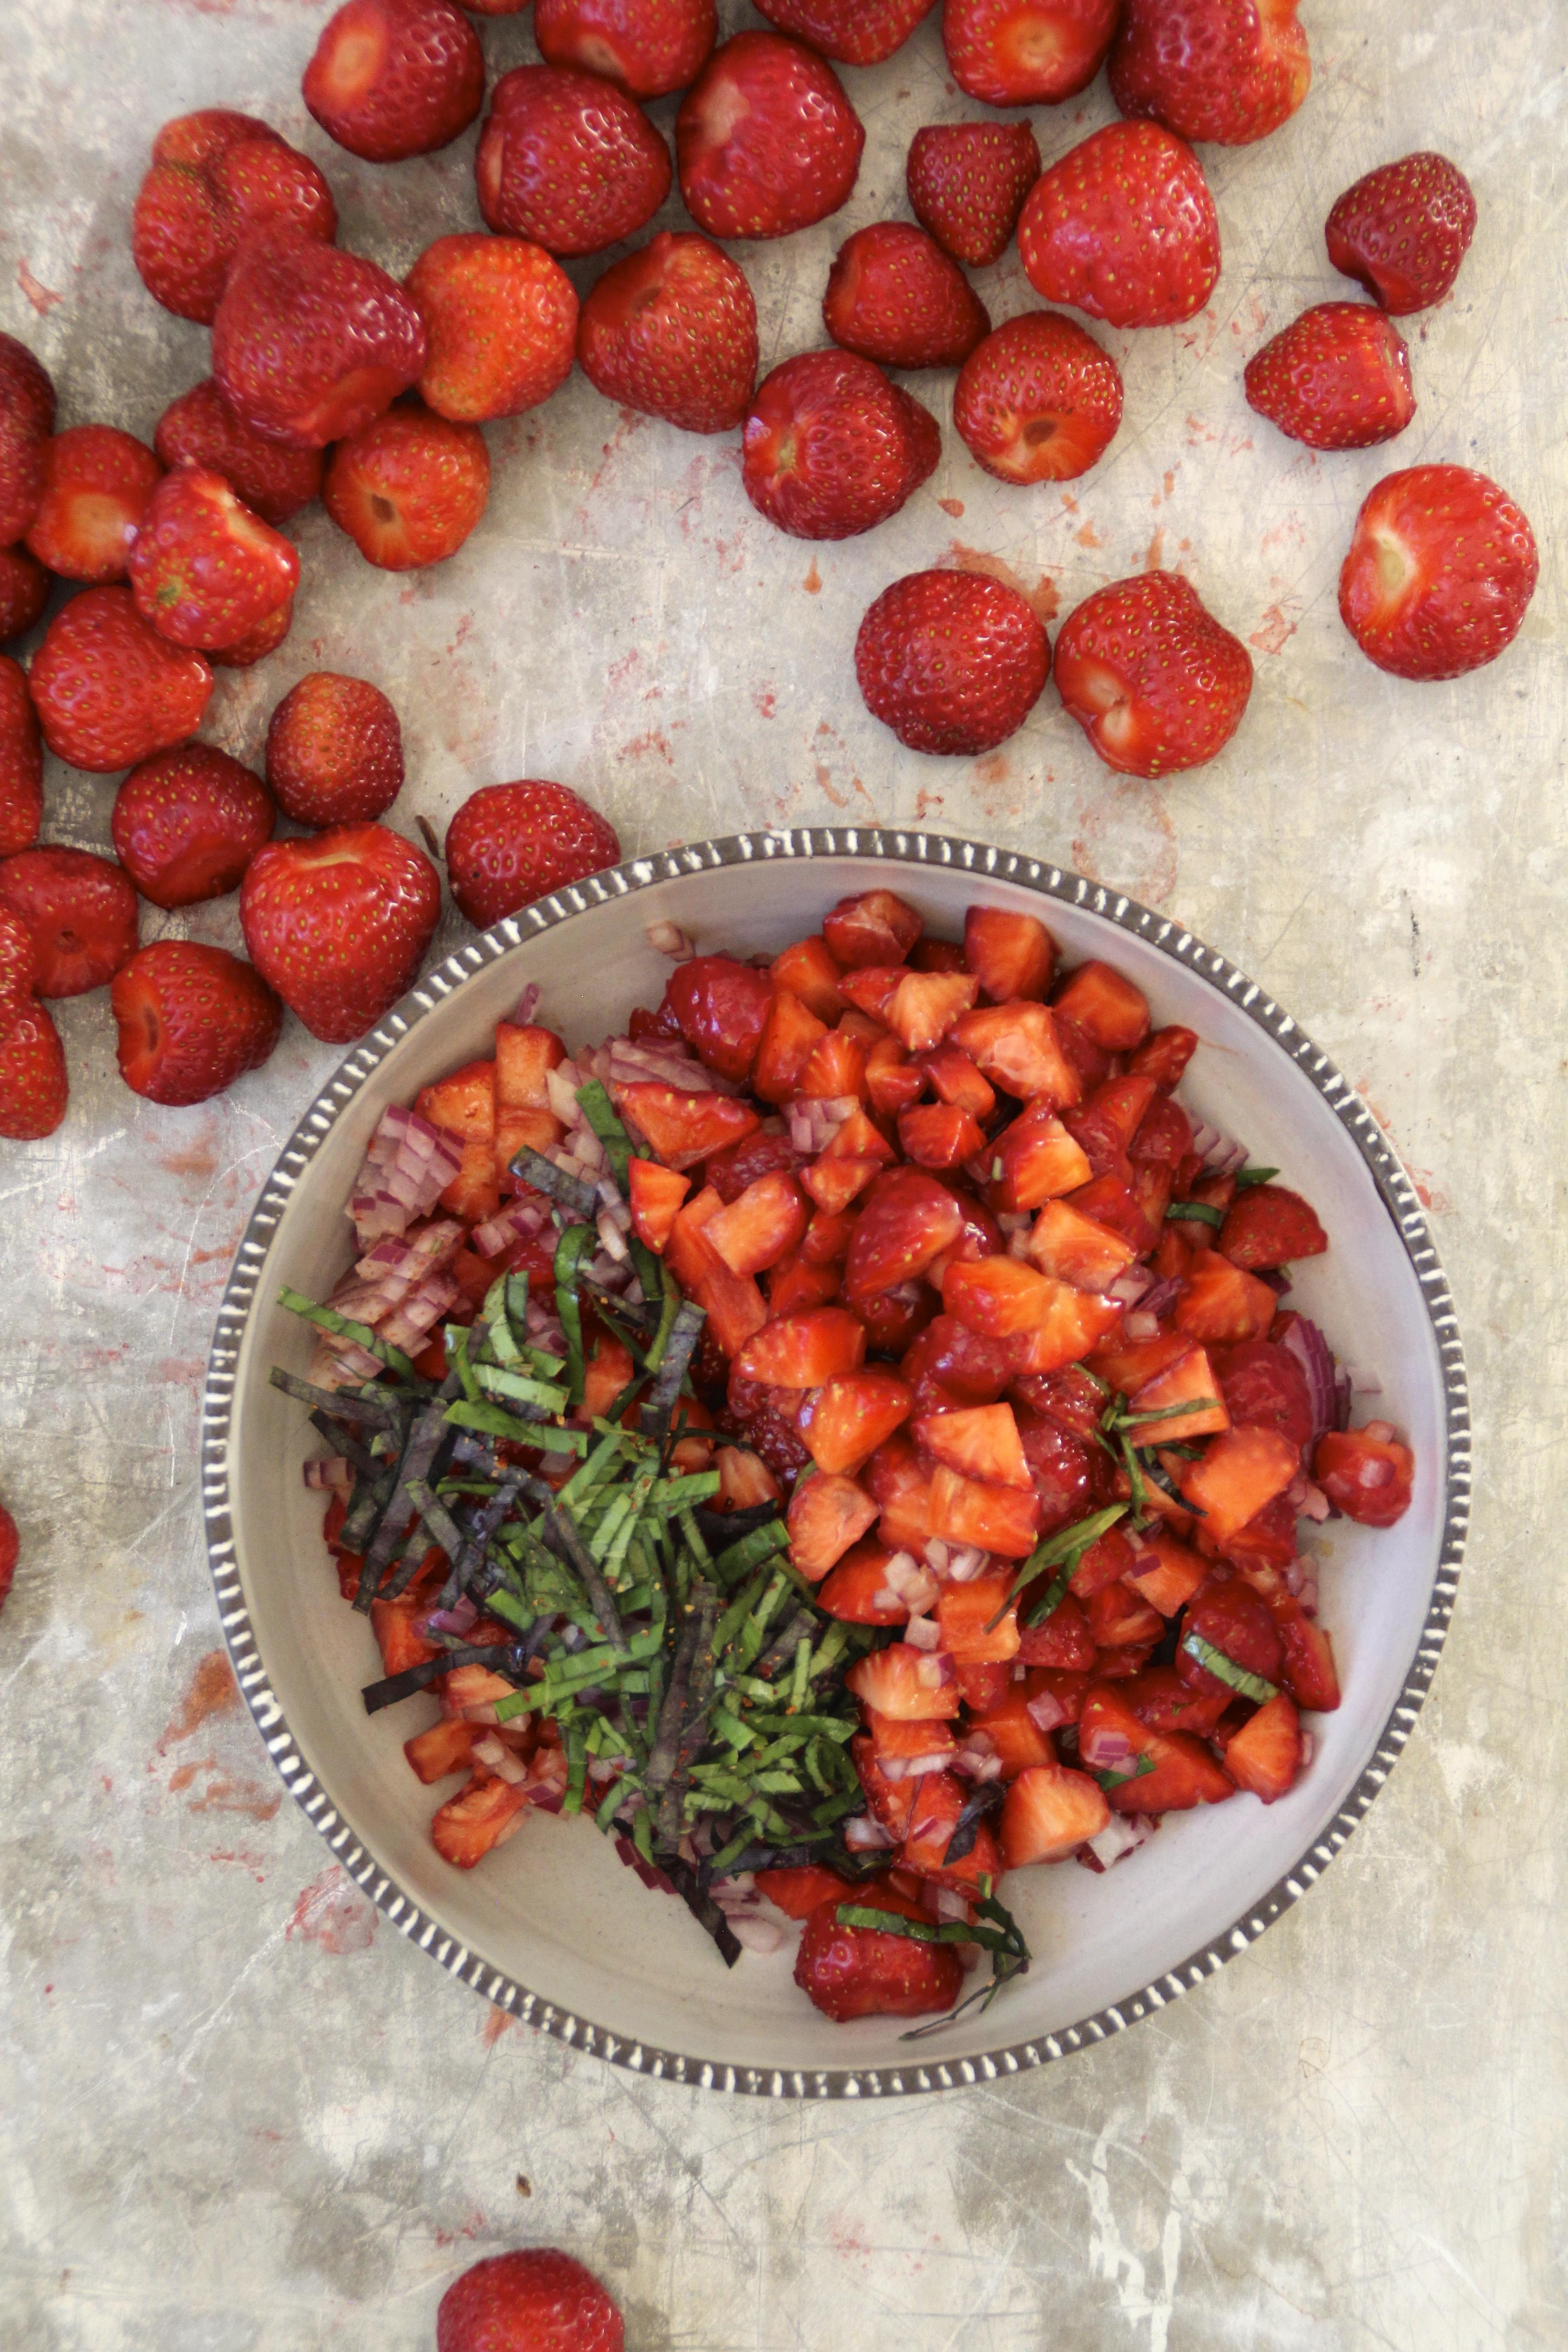 jordbærsalsa